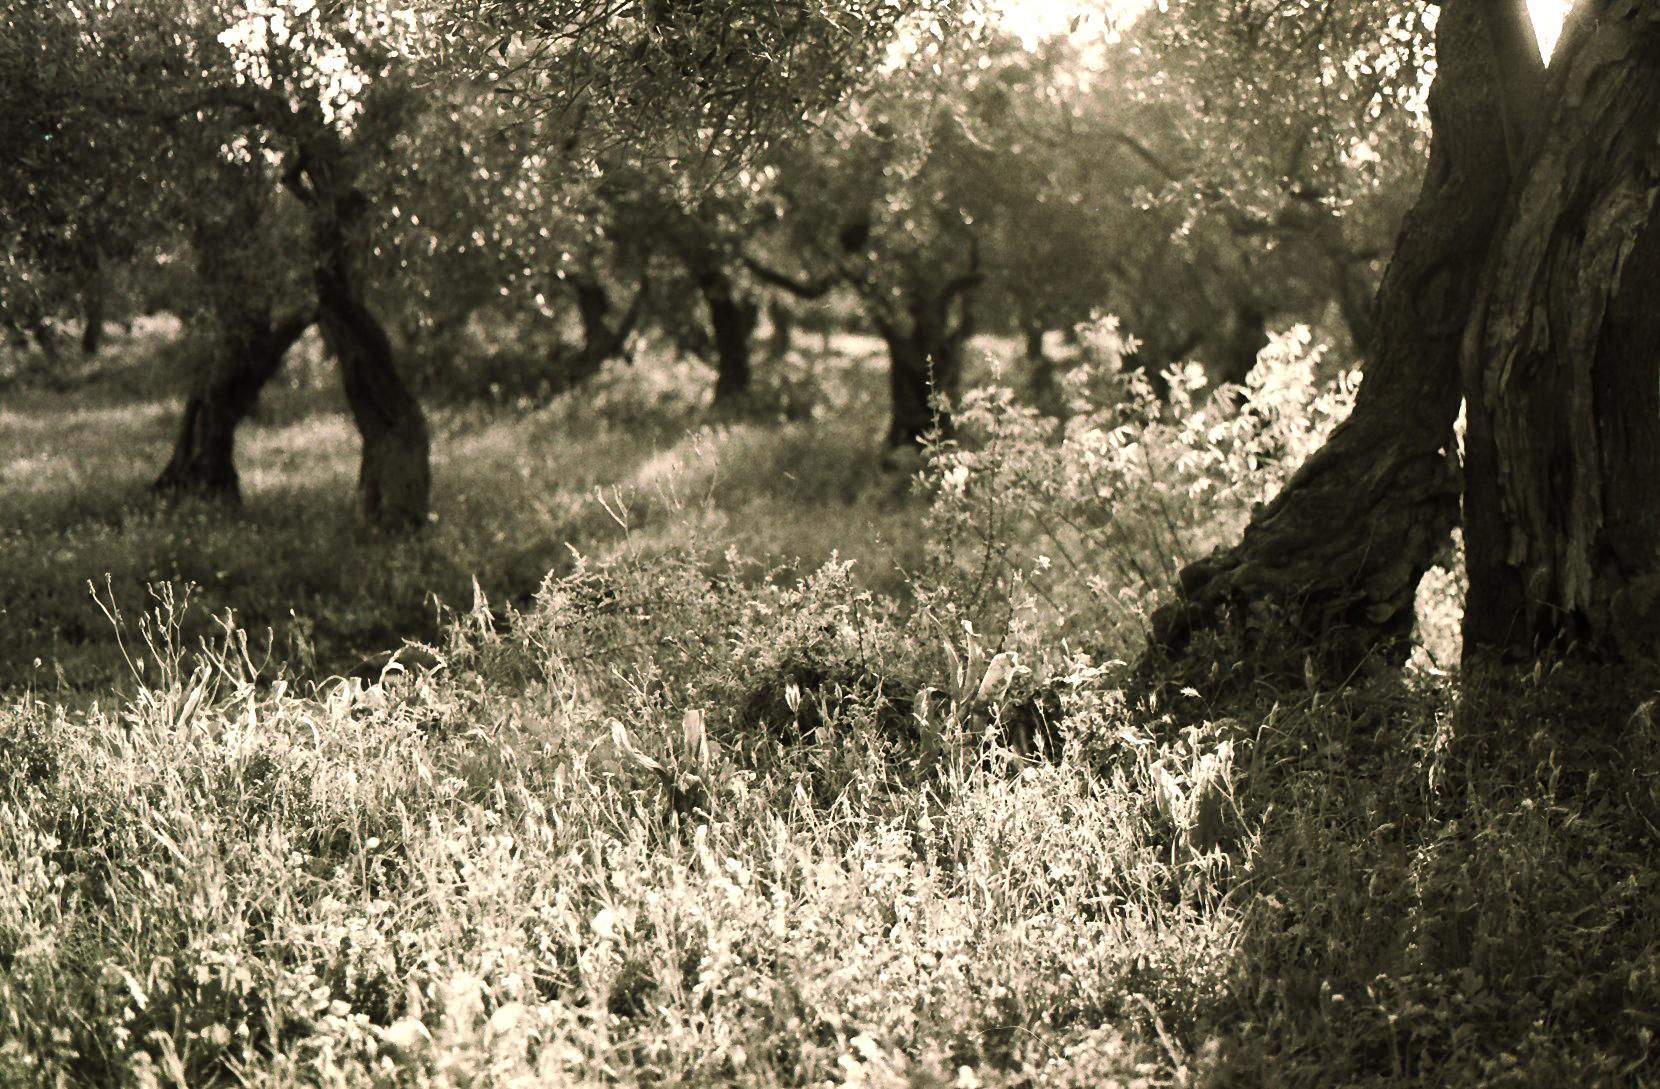 Olive grove in Chekka  - North Lebanon